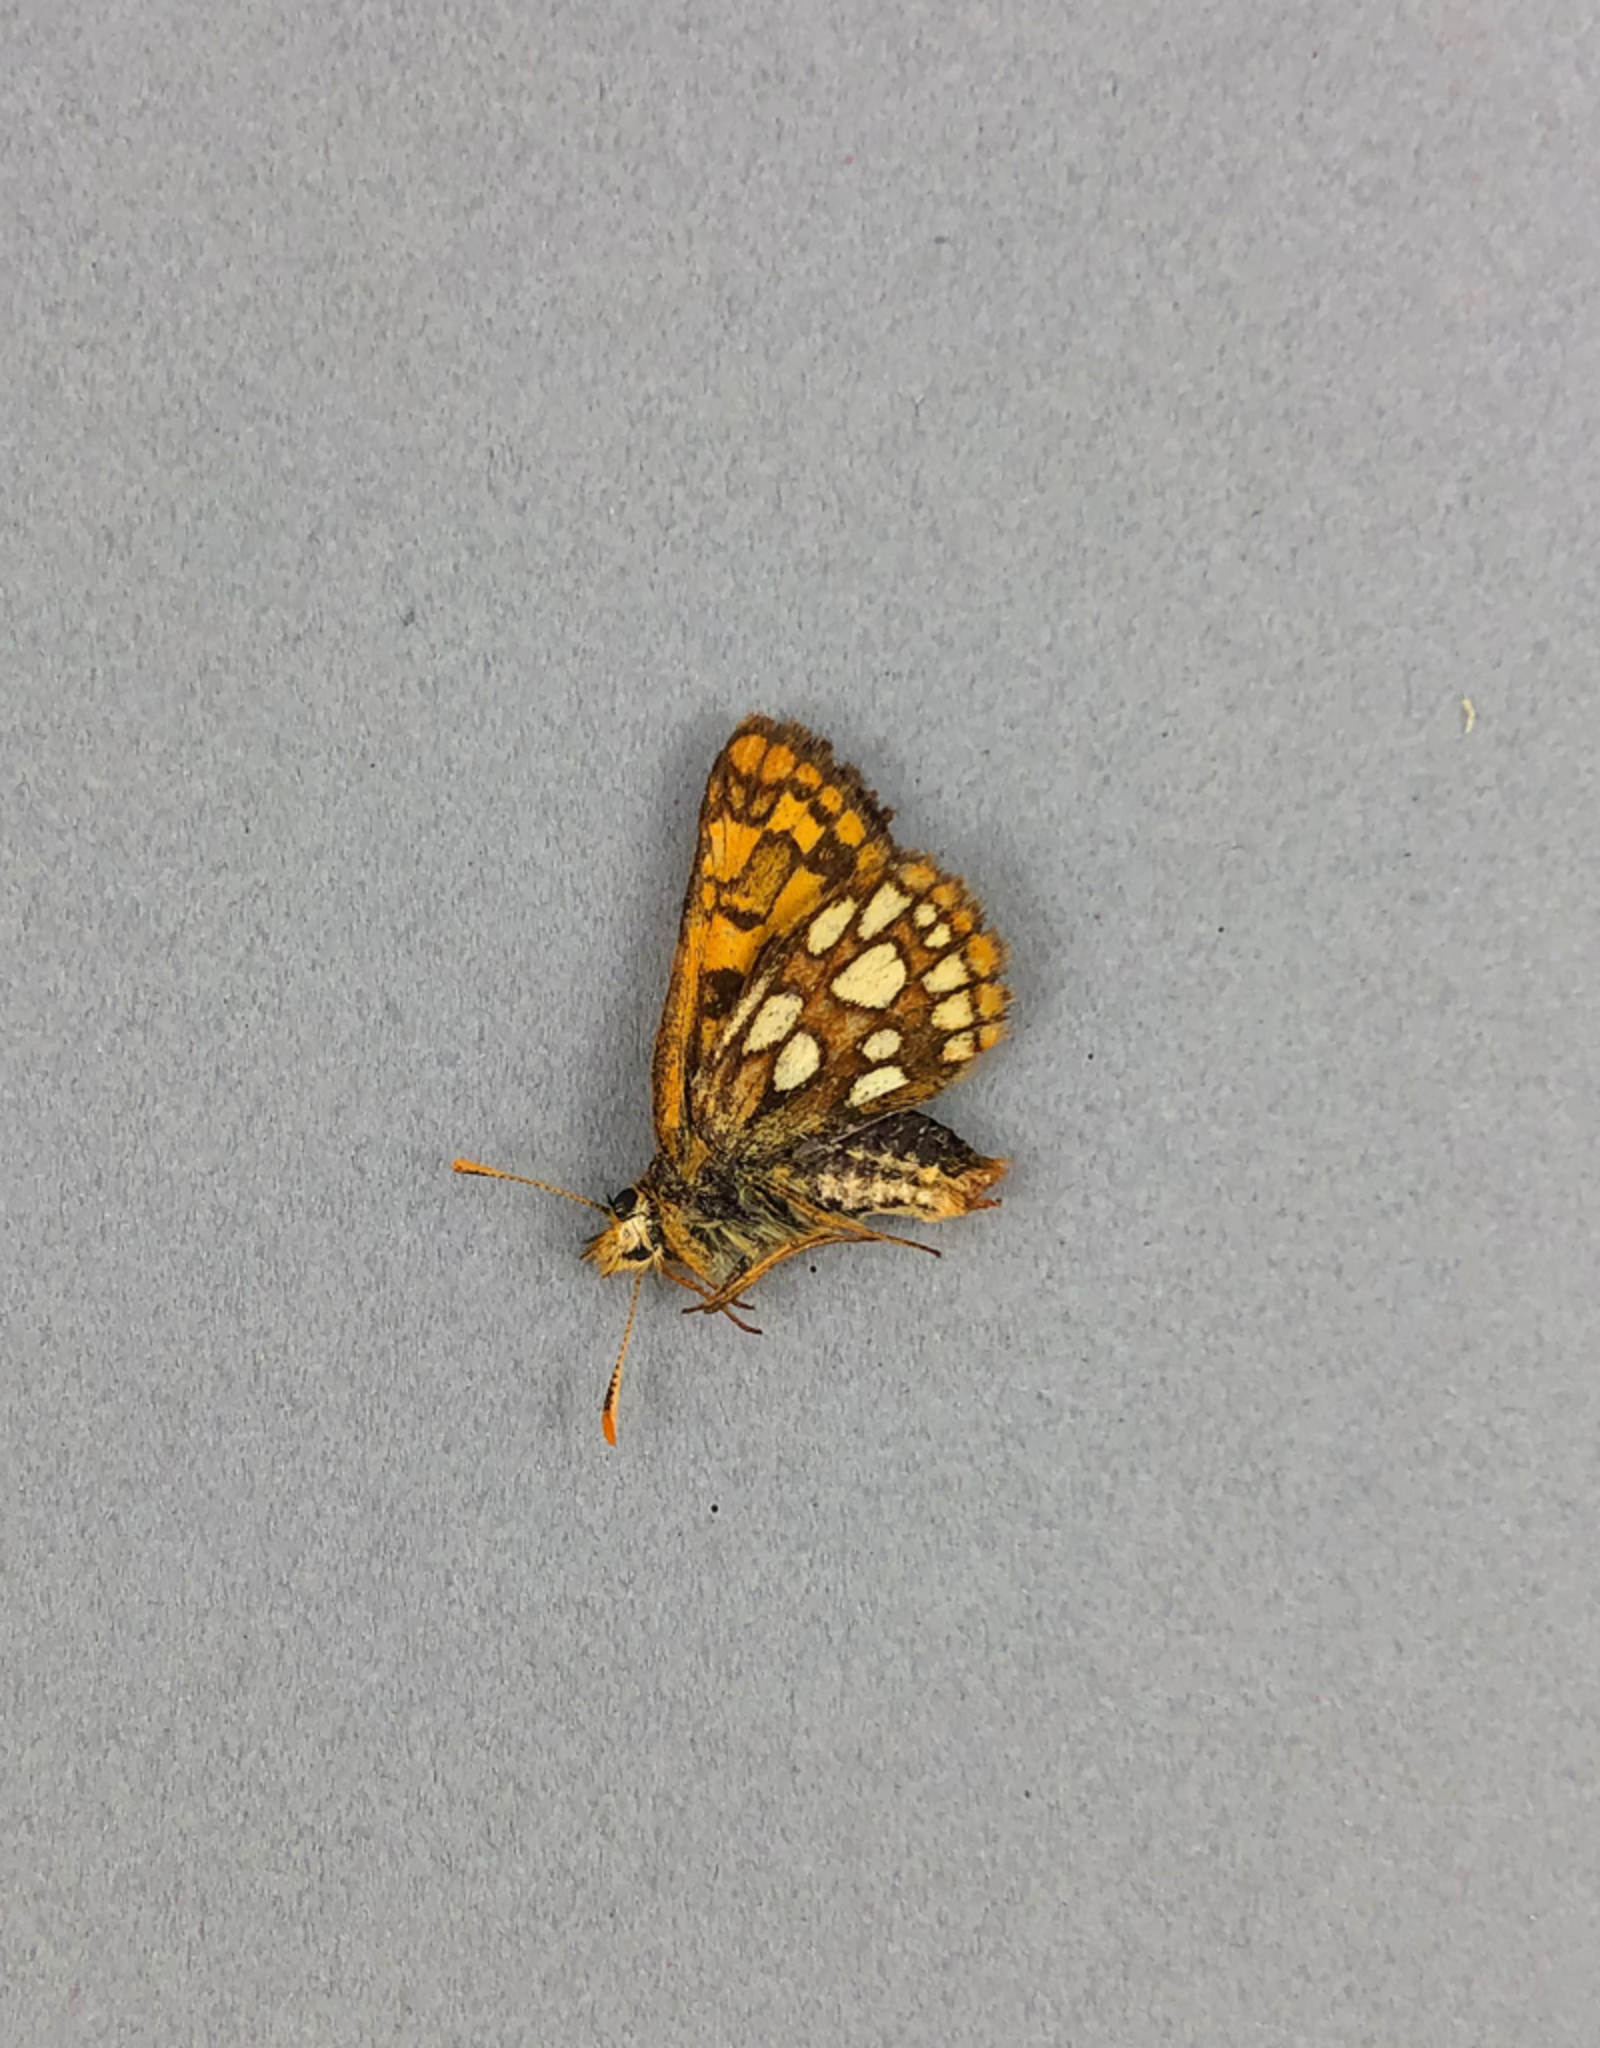 Carterocephalus palaemon mandan M A1- Canada